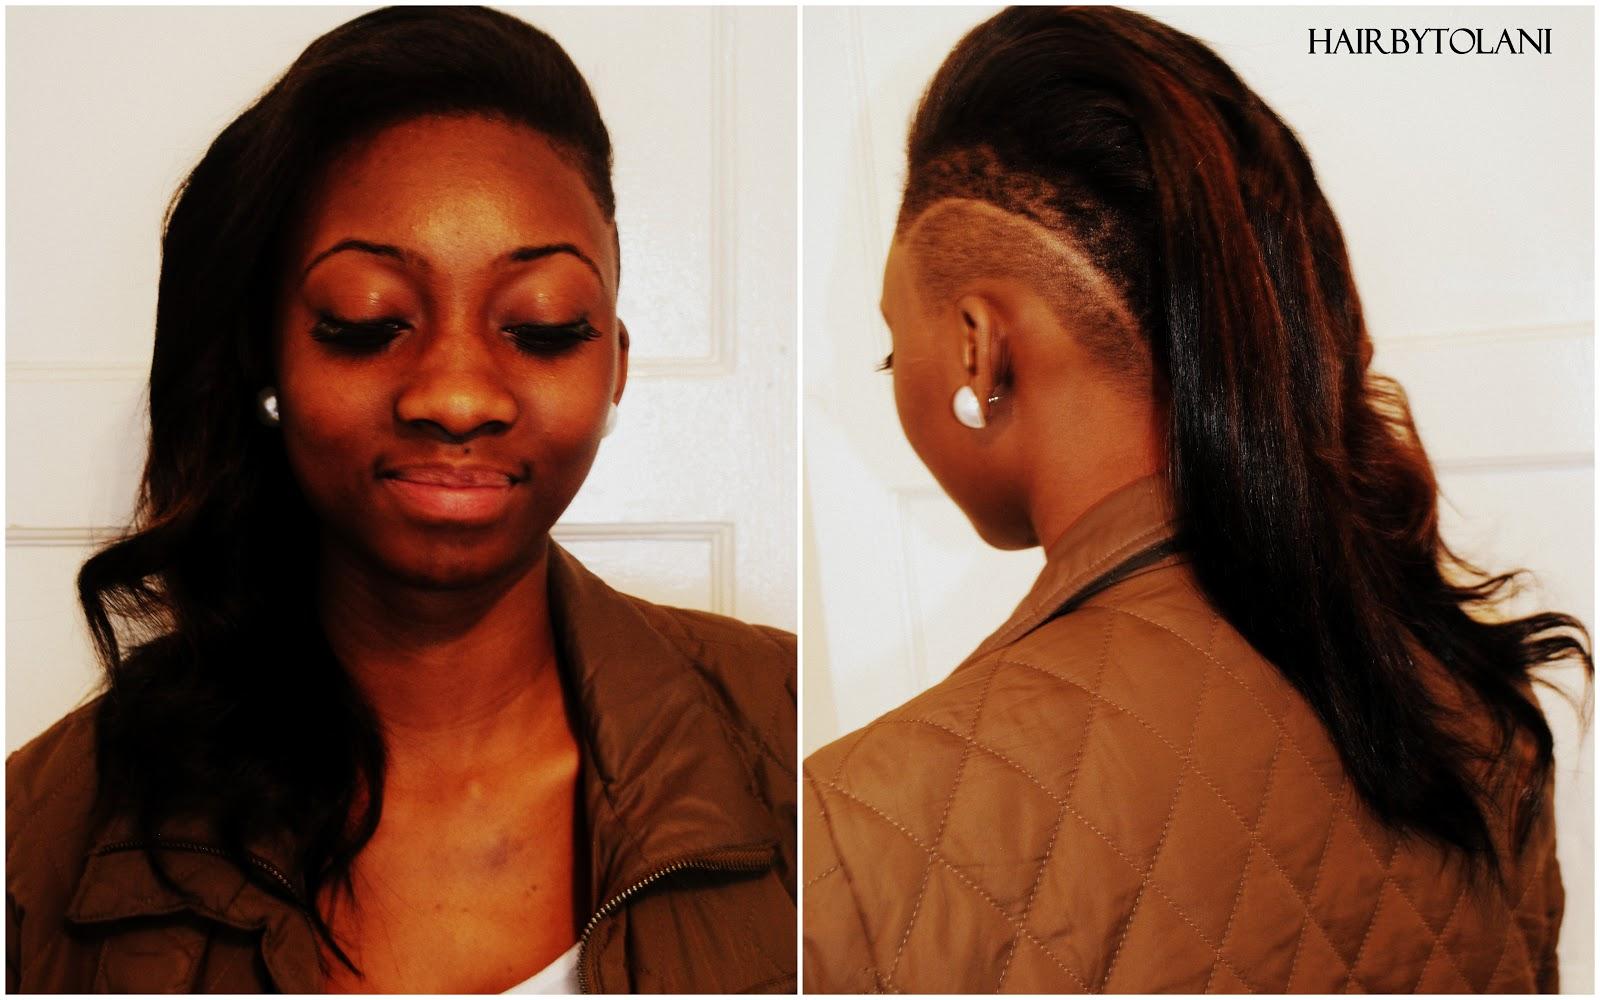 http://1.bp.blogspot.com/-unWVs6hpbv4/T3sCFHGNZ7I/AAAAAAAAFEY/zN_GiZ5wQg4/s1600/HairbyTolan+Maria+vs+Rihanna\'s+new+hair+style+(2).jpg